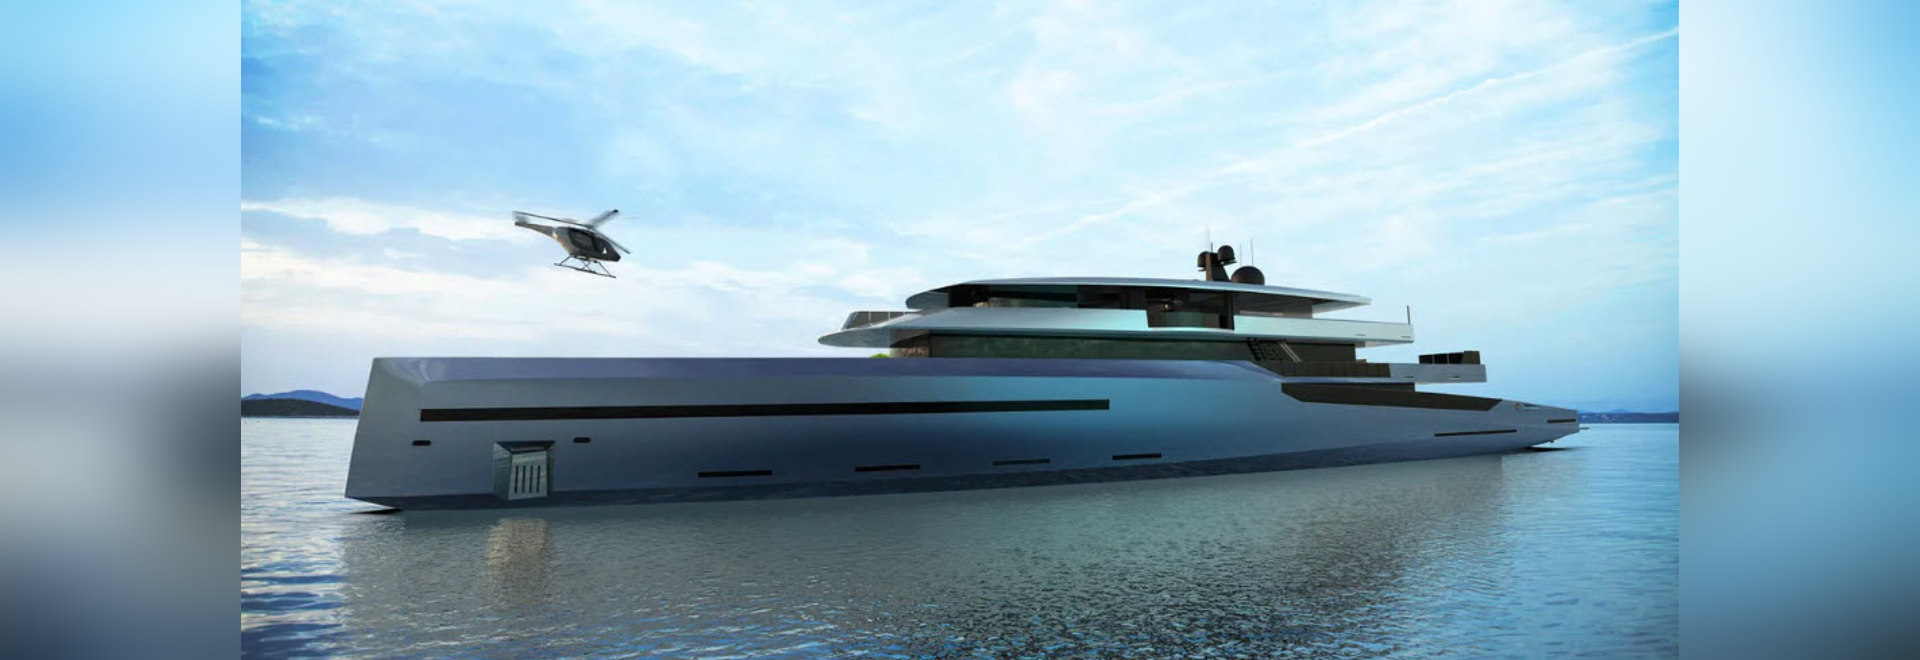 BYD Group Reveals 75 Metre Superyacht Concept Bravo 75